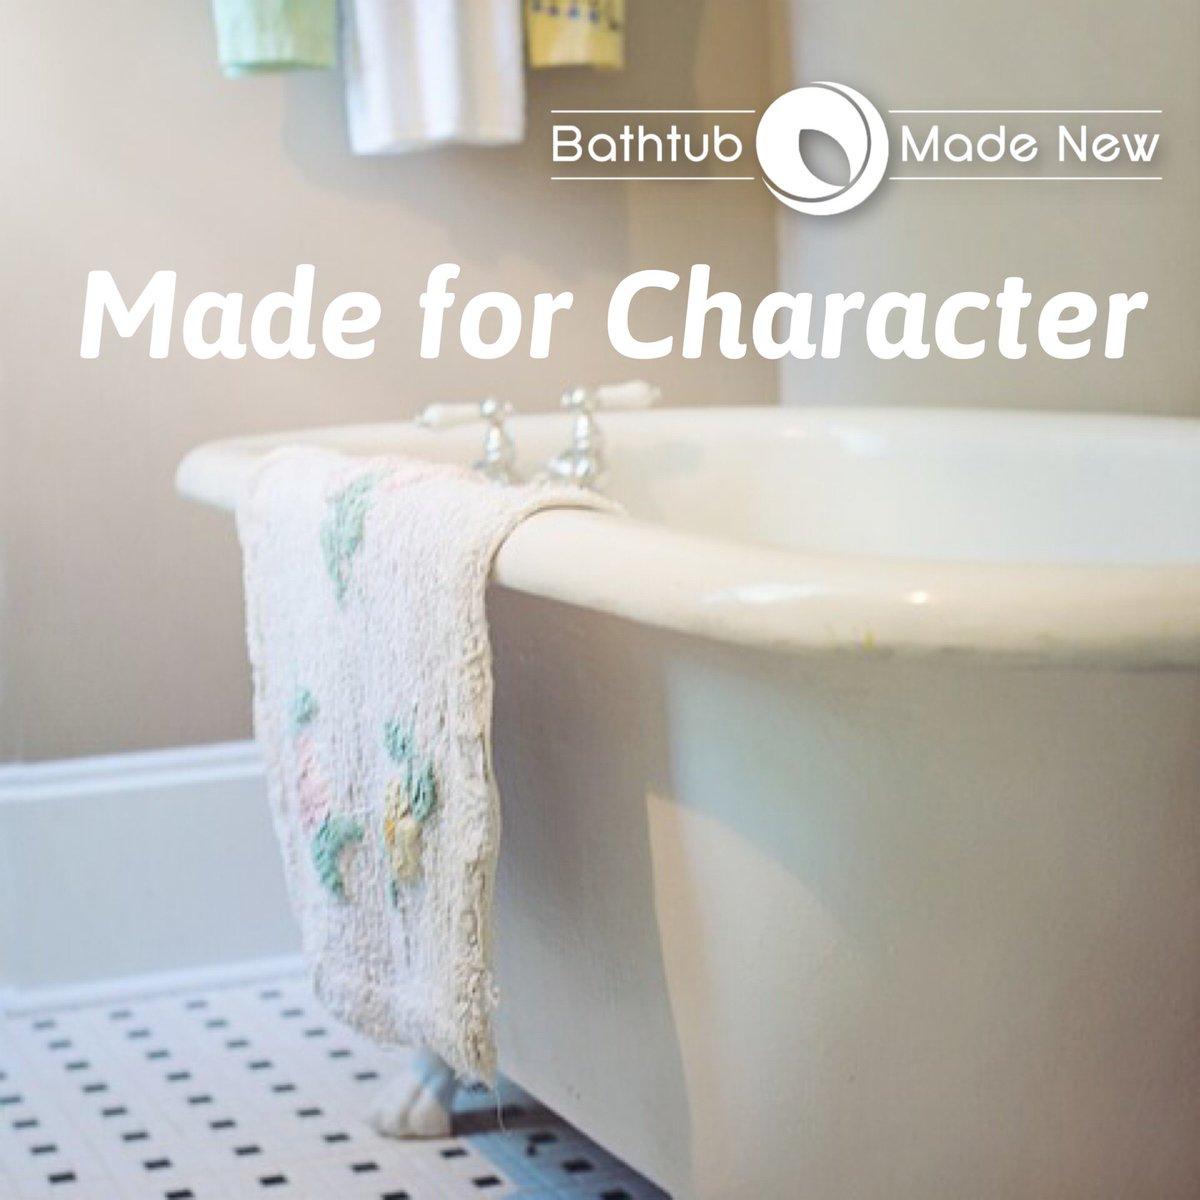 Bathtub Made New (@BathtubMadeNew)   Twitter